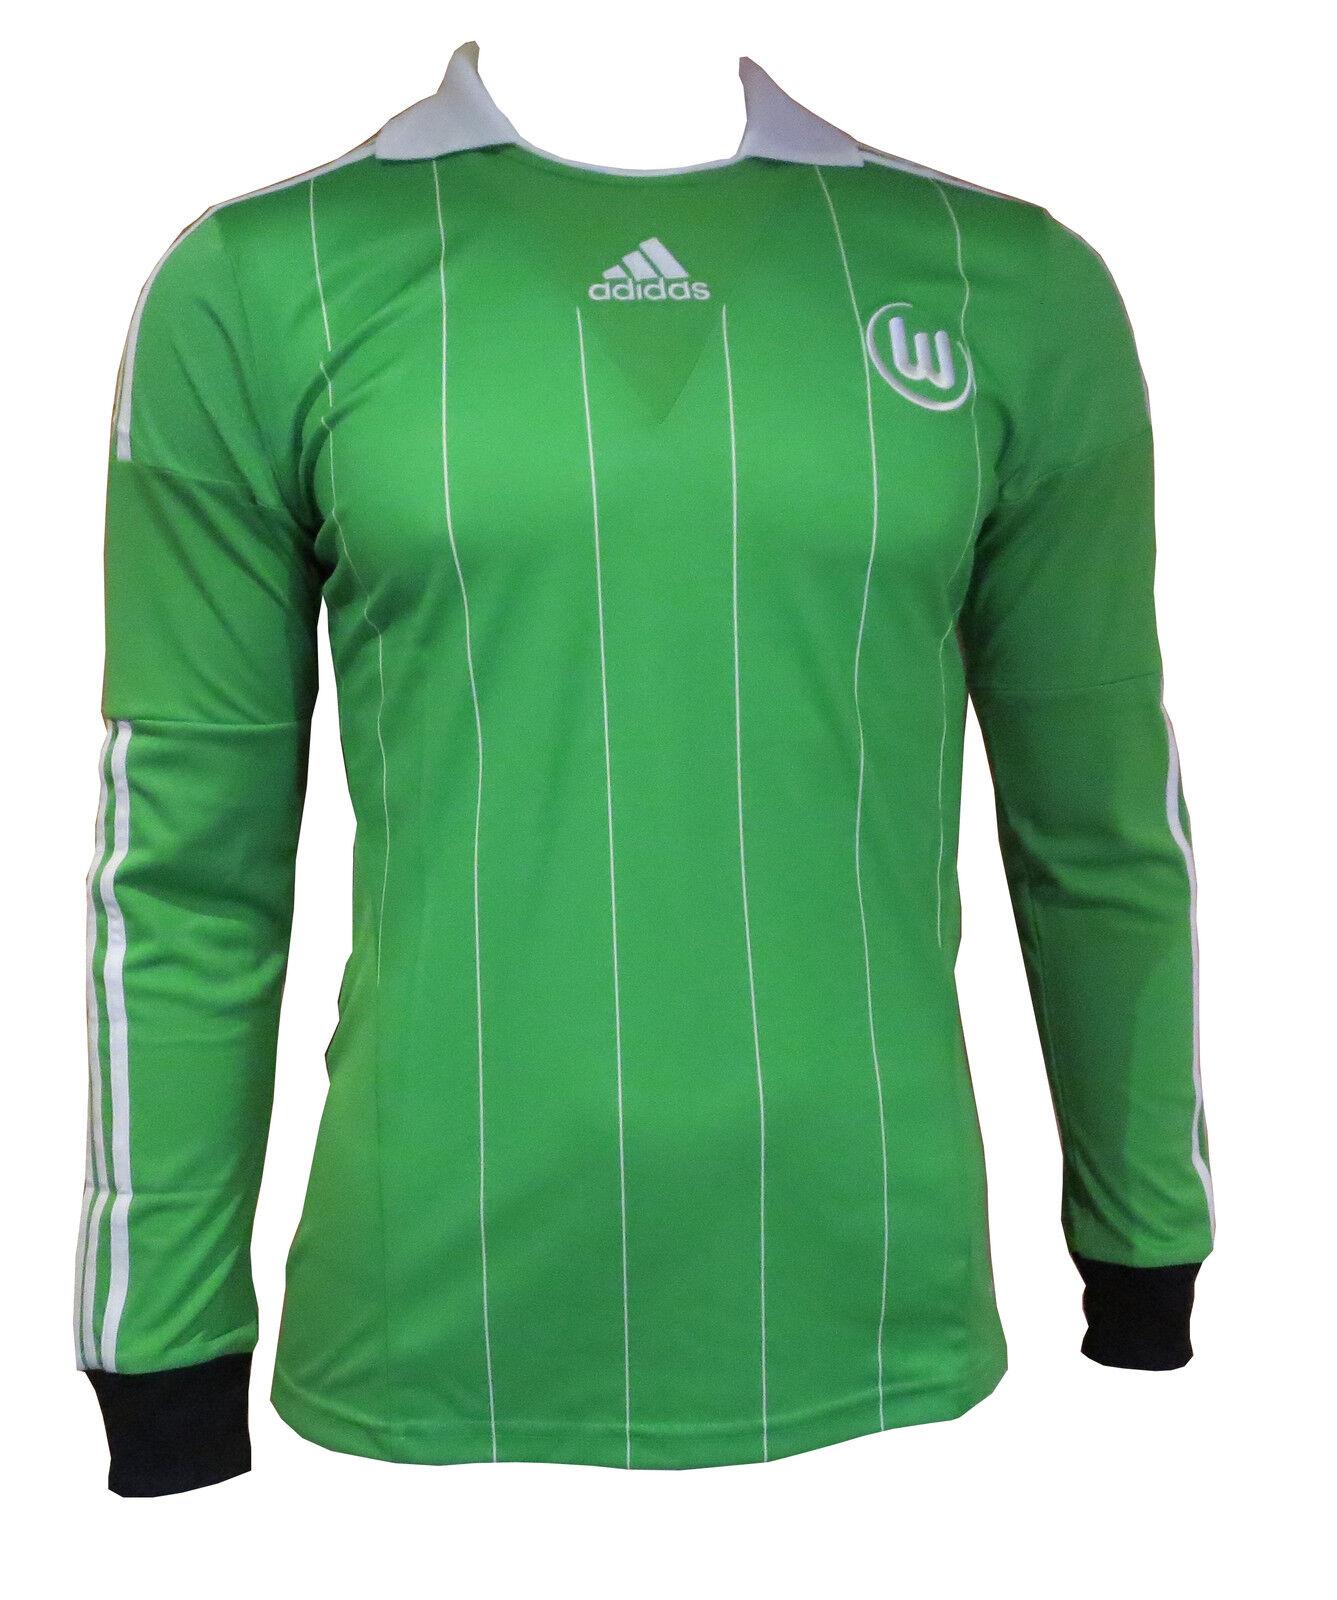 Adidas Vfl Wolfsburg Jersey [SIZE S] Long Sleeve Green G69029 Nip